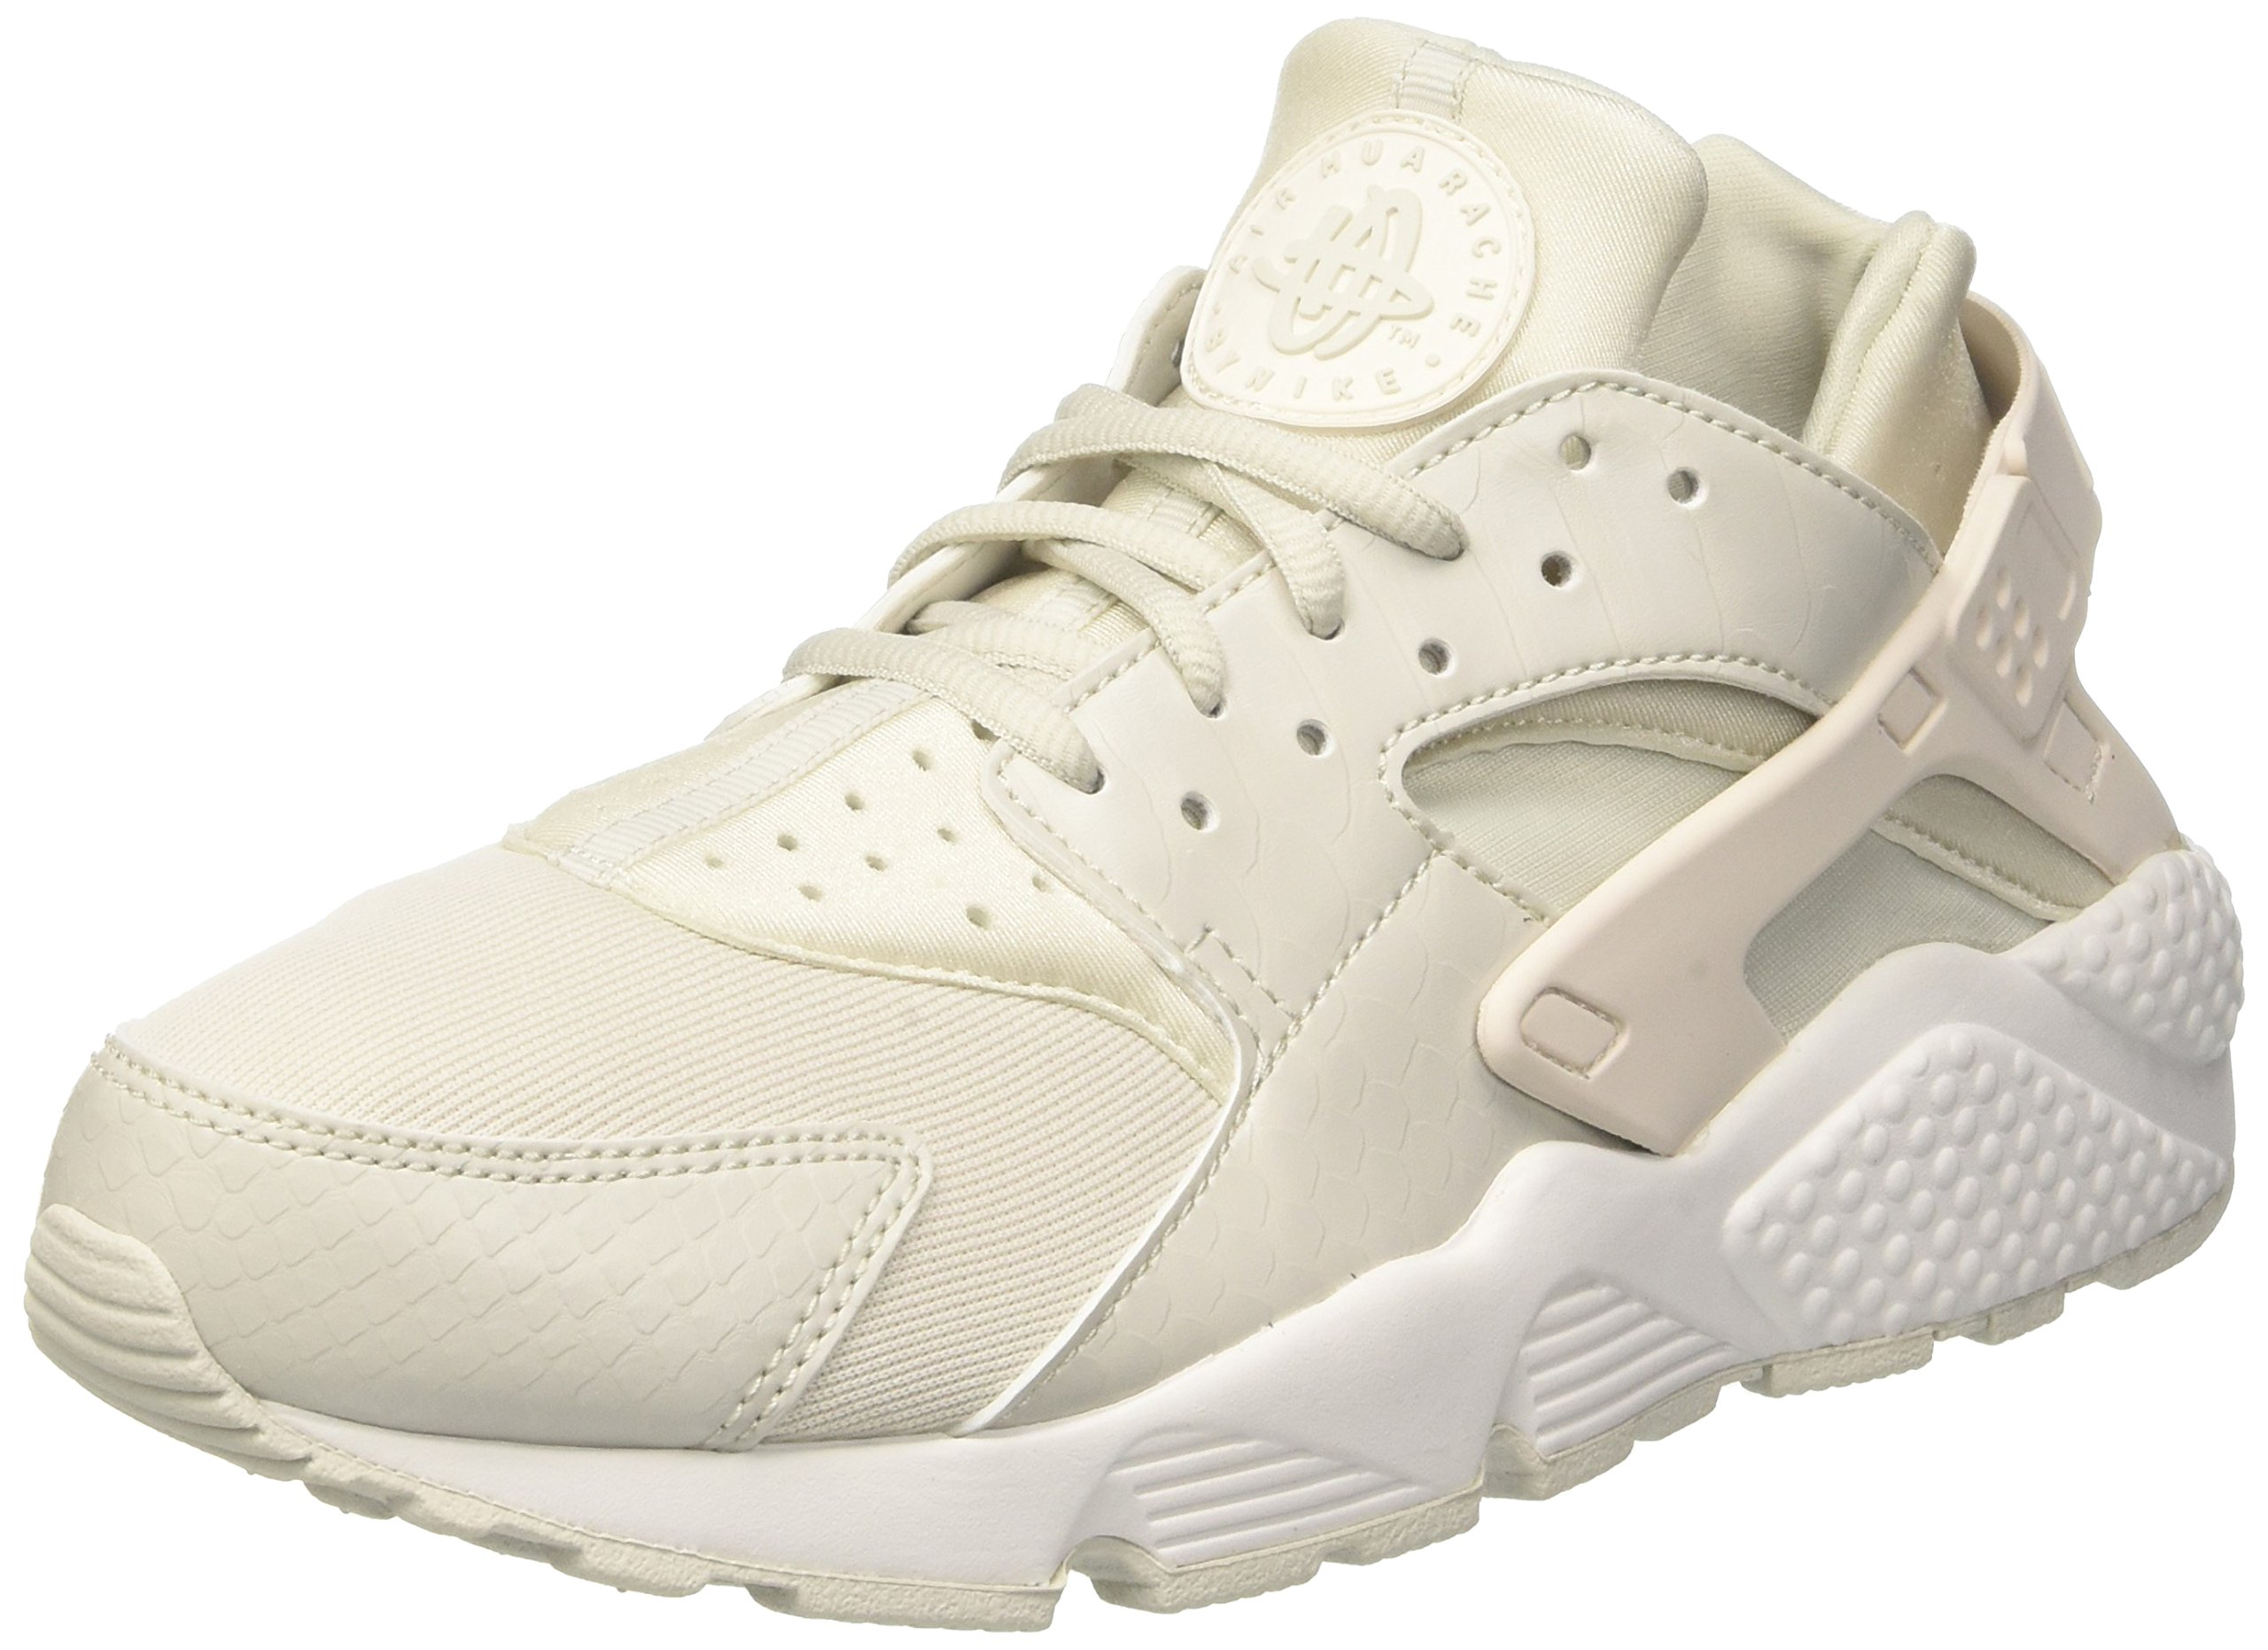 Galleon - NIKE Air Huarache Run Women s Running Shoes Phantom Light Bone  634835-028 (8.5 B(M) US) 0113d472cb